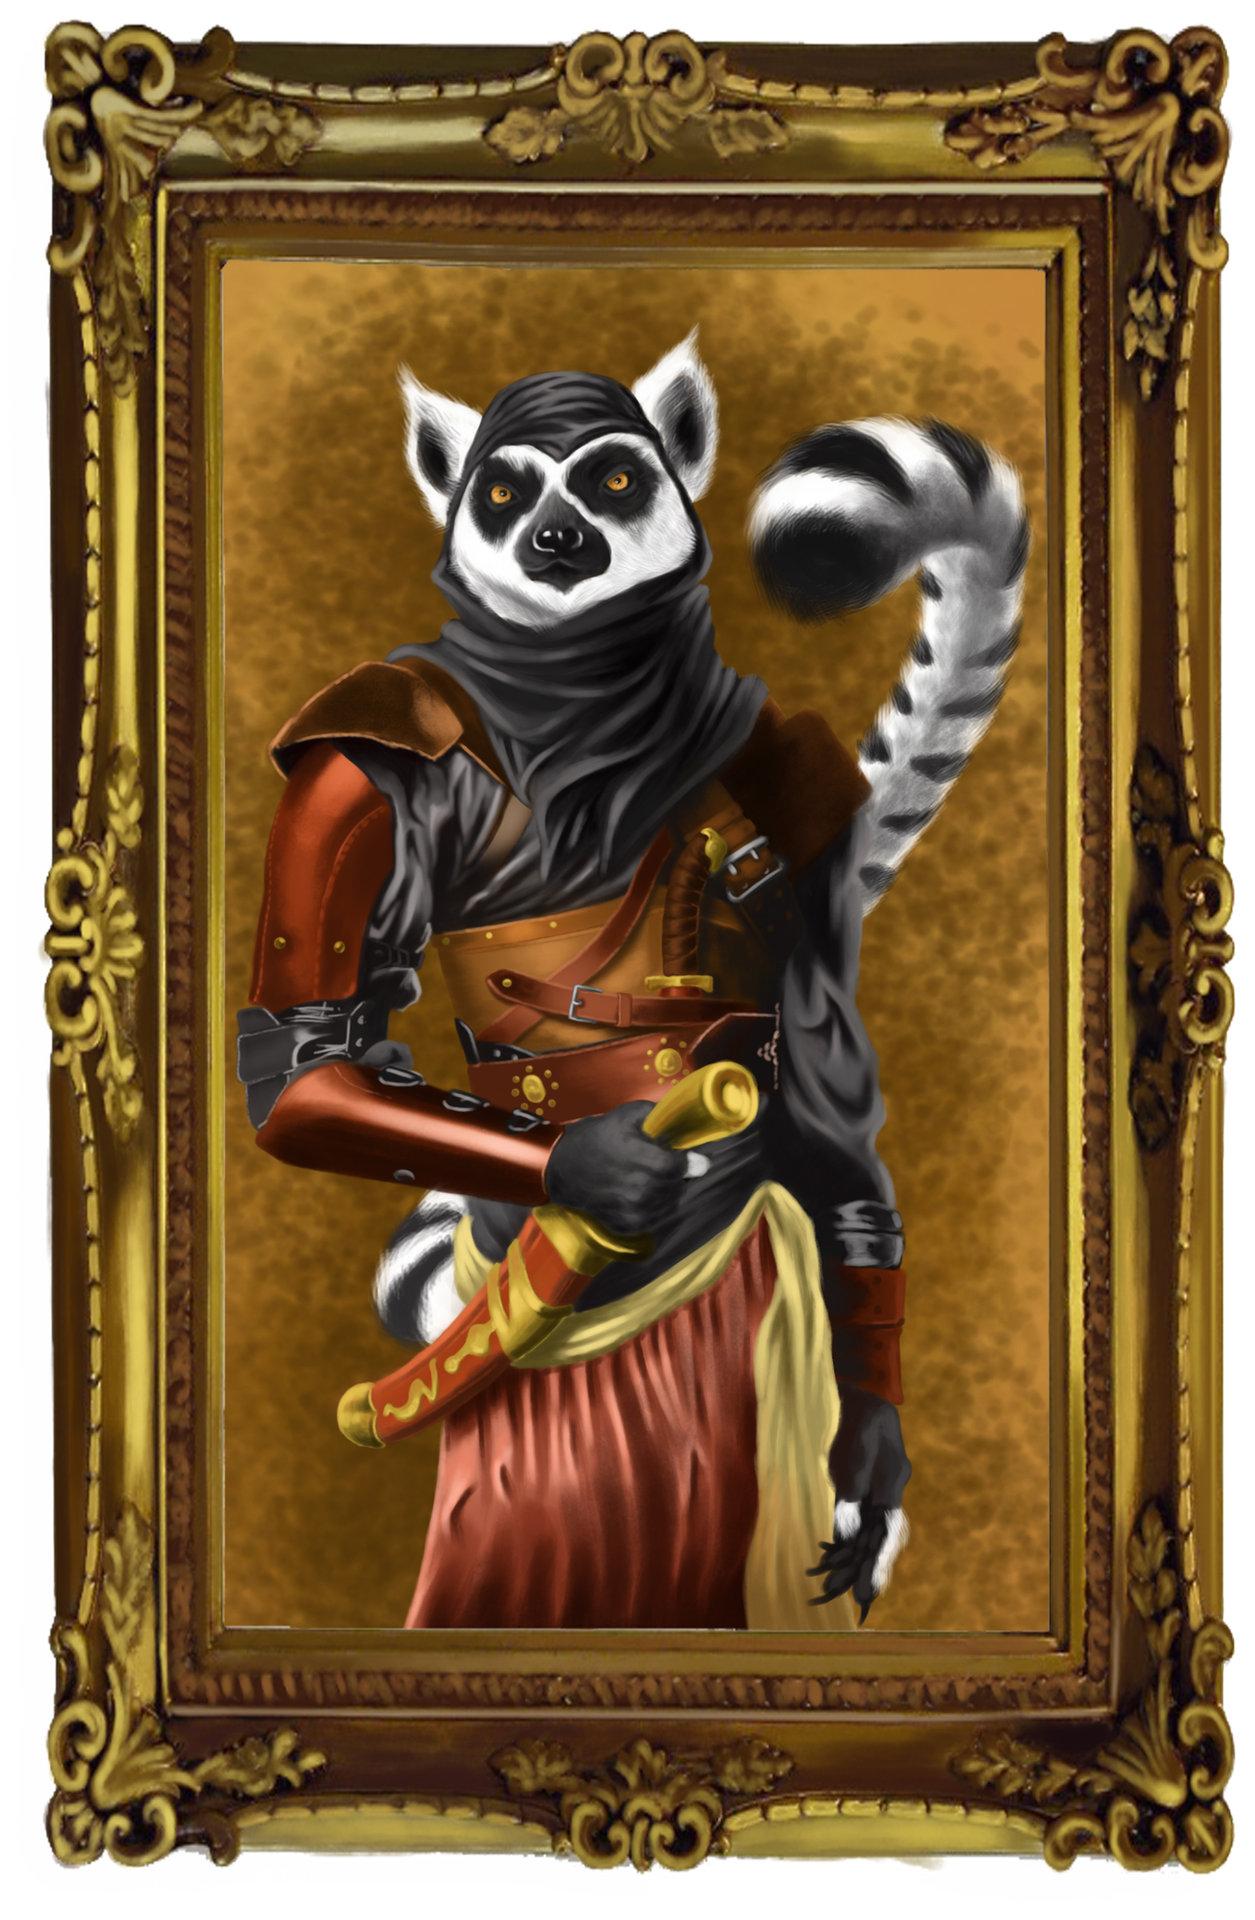 Daniel hidalgo vicente lemur marco